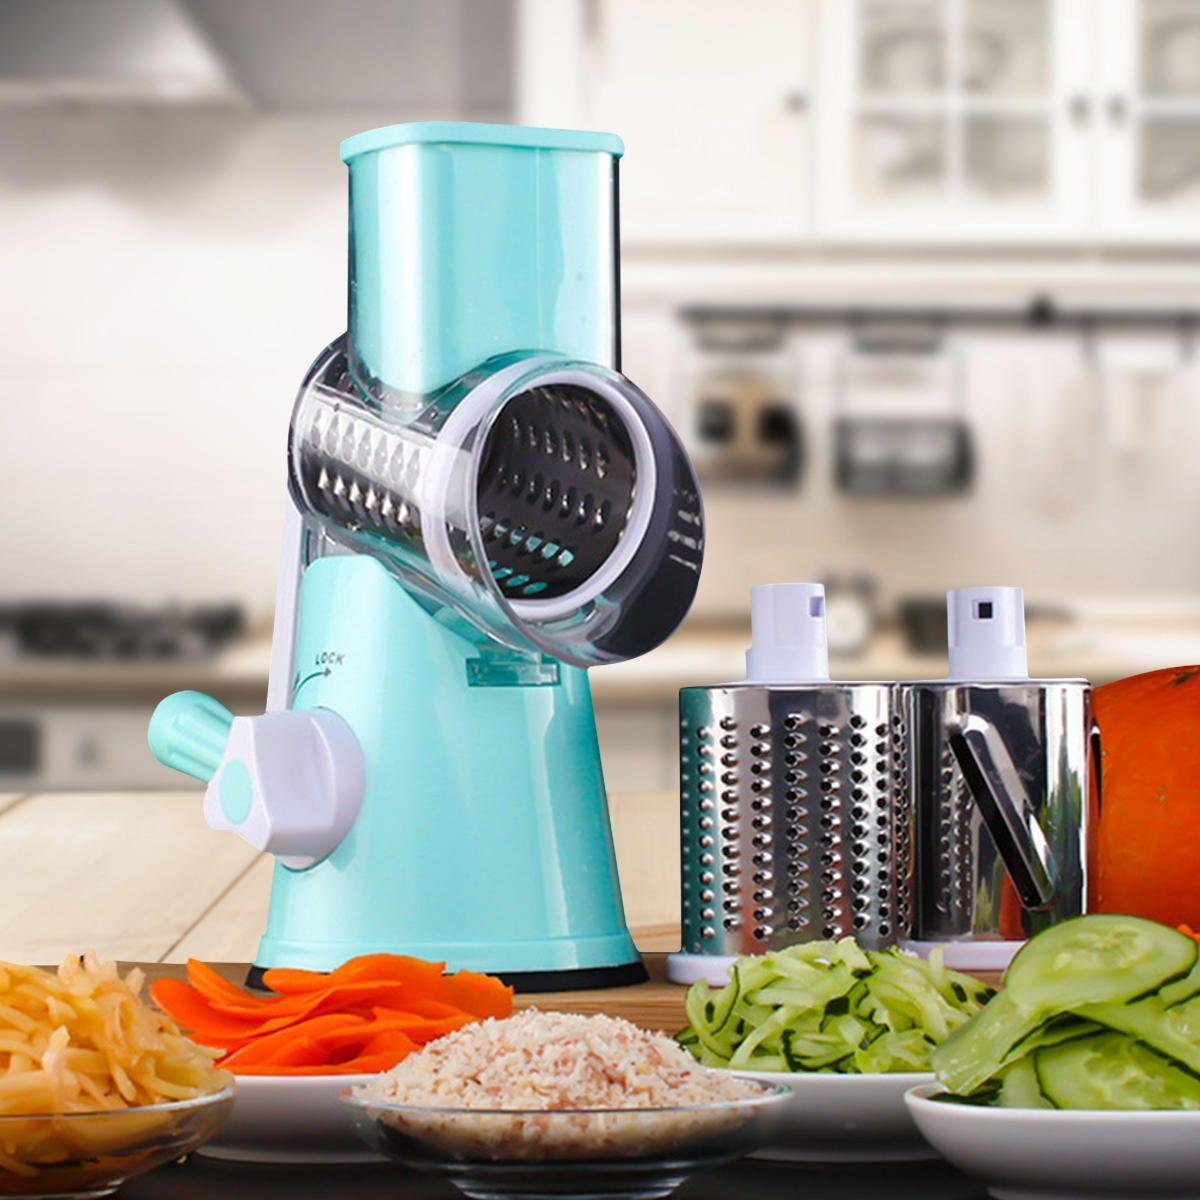 TBI US$28.49 Manual Vegetable Potato Roller Cutter Stainless Steel Blade Kitchen Slicer Roller Cutting Machine